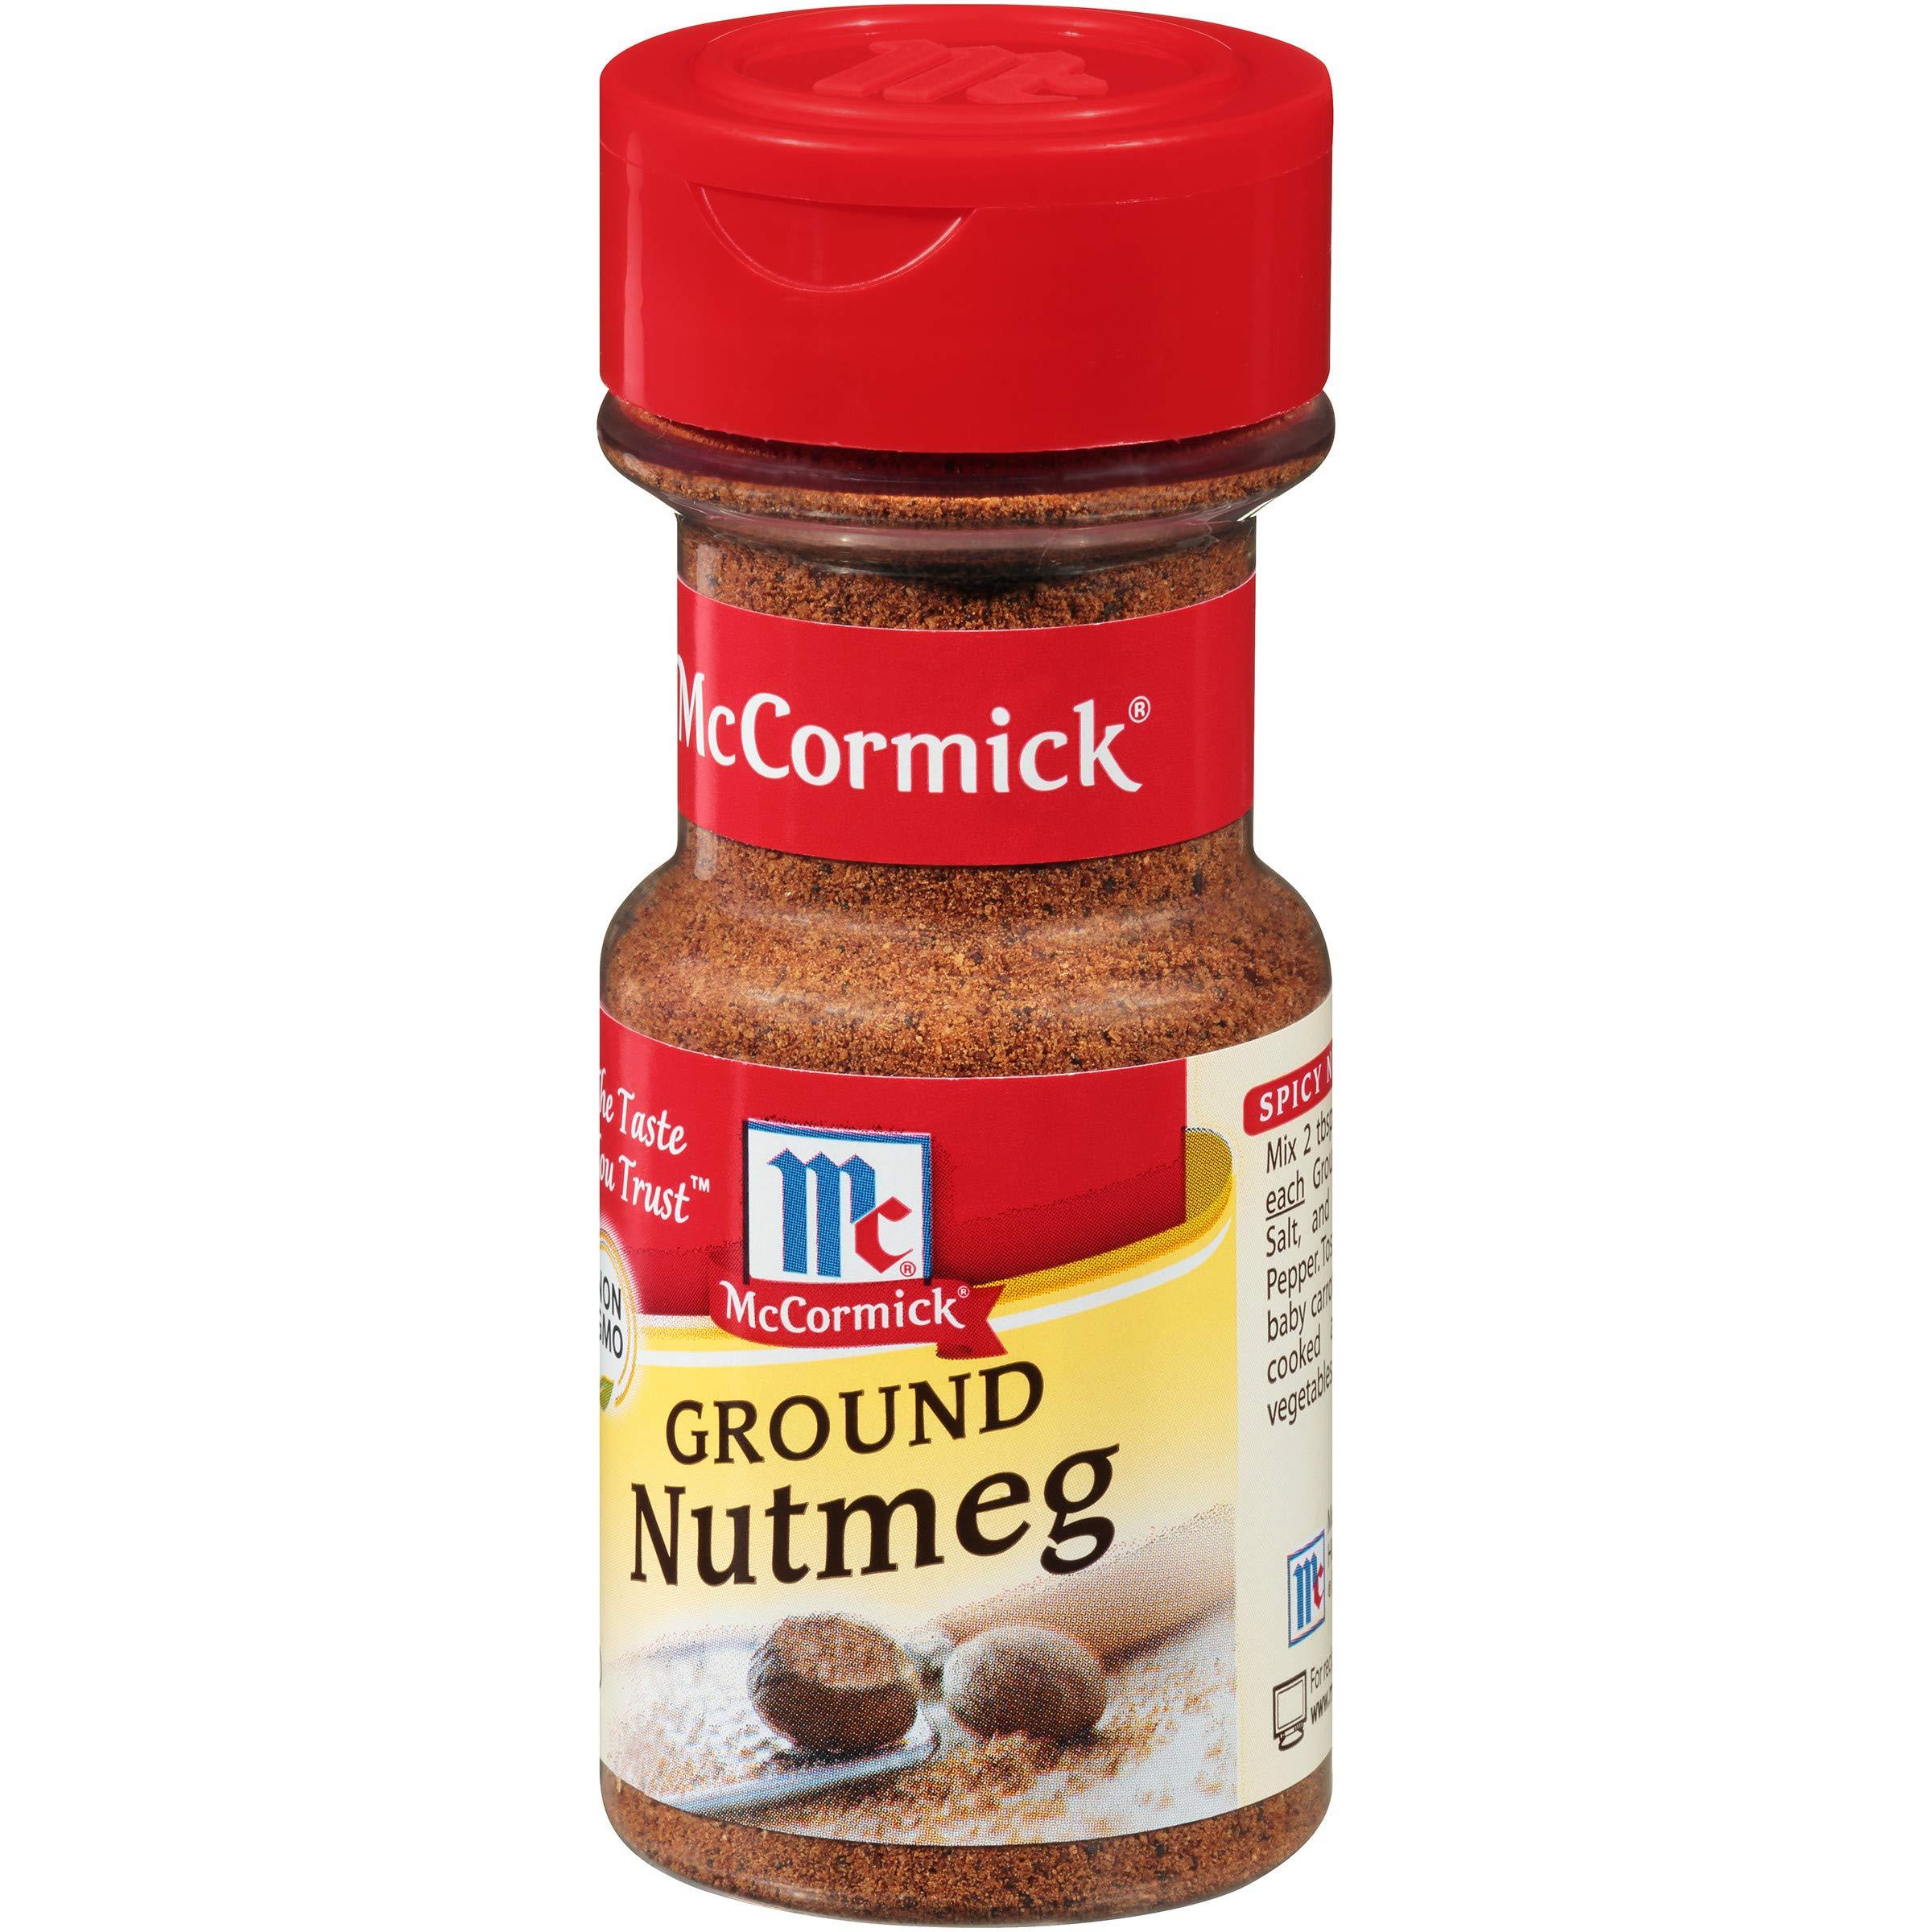 McCormick Ground Nutmeg, 2 oz